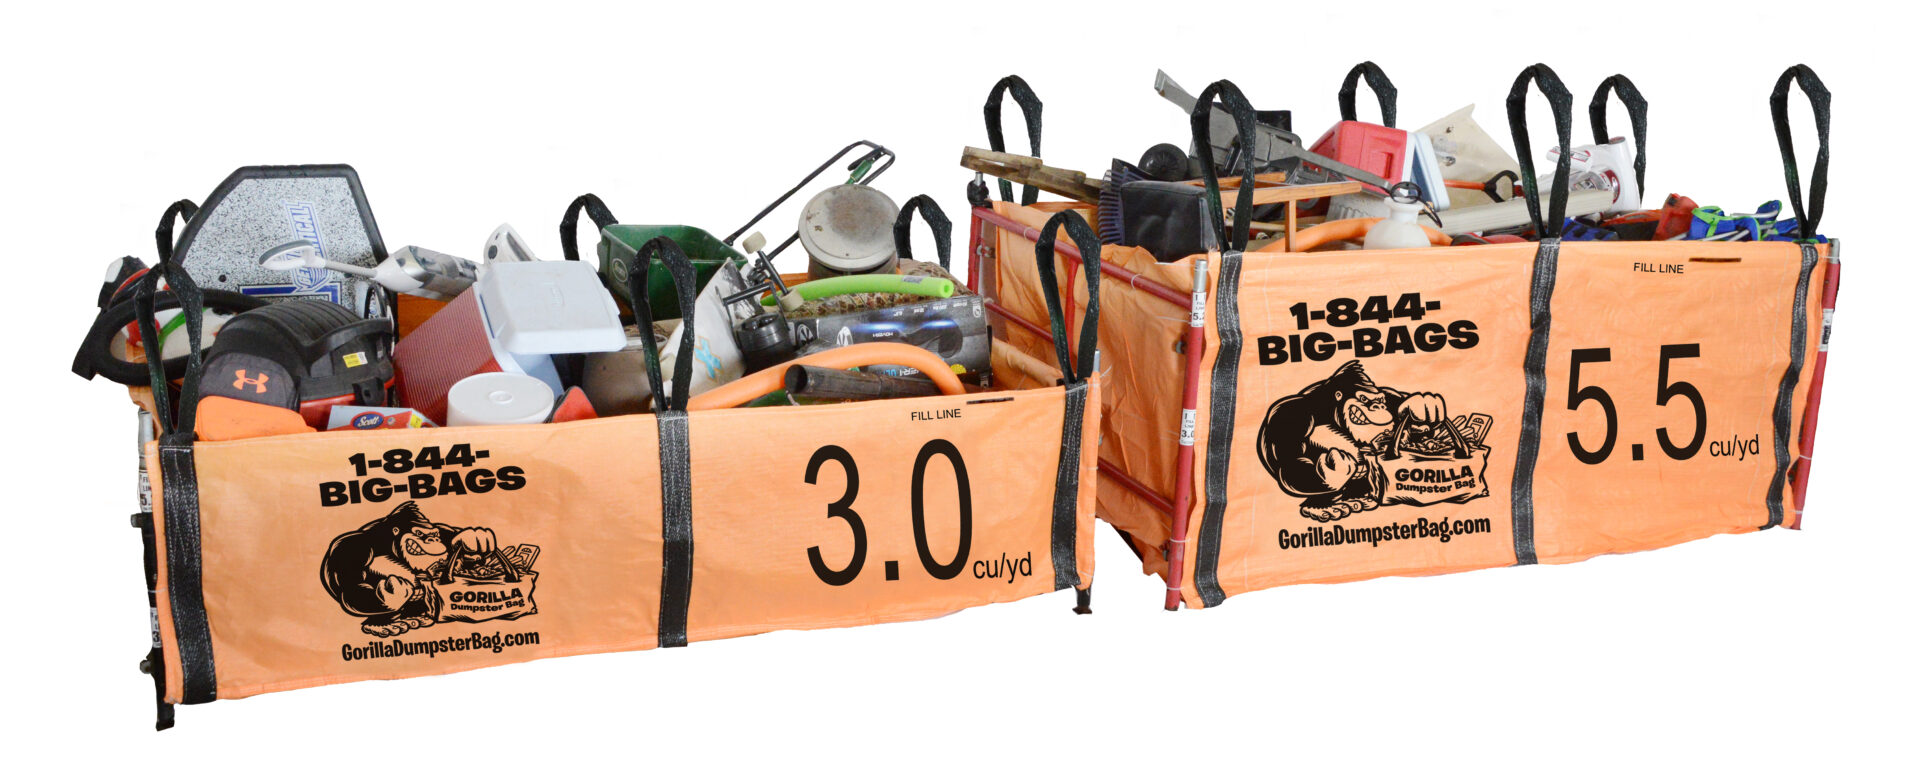 2 bags